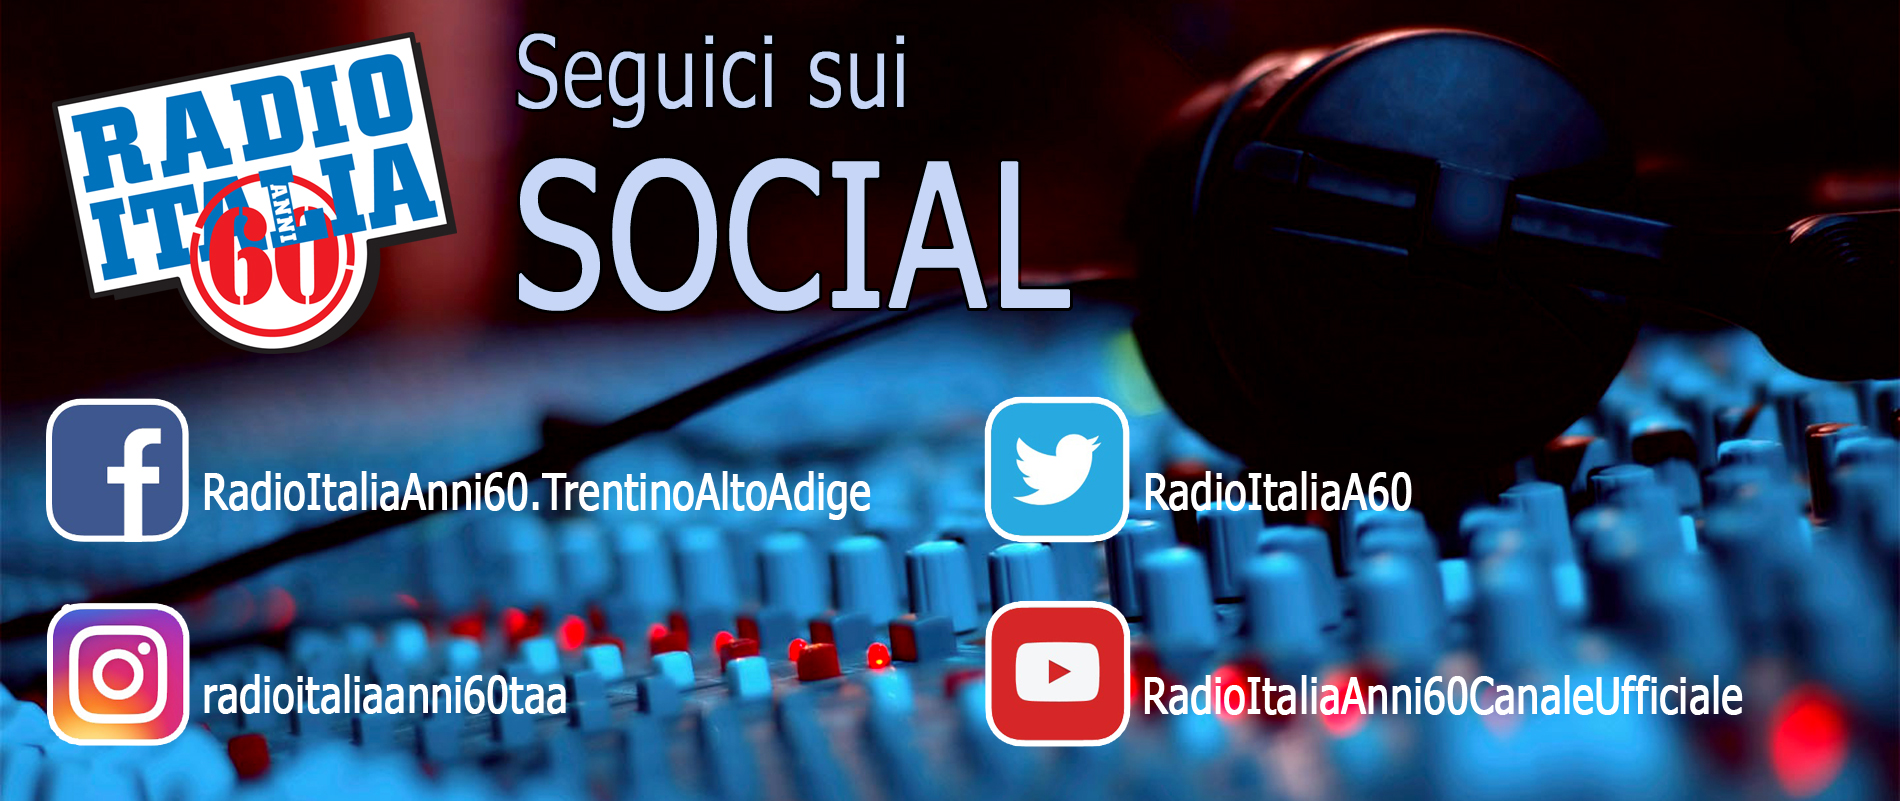 ria60-social1